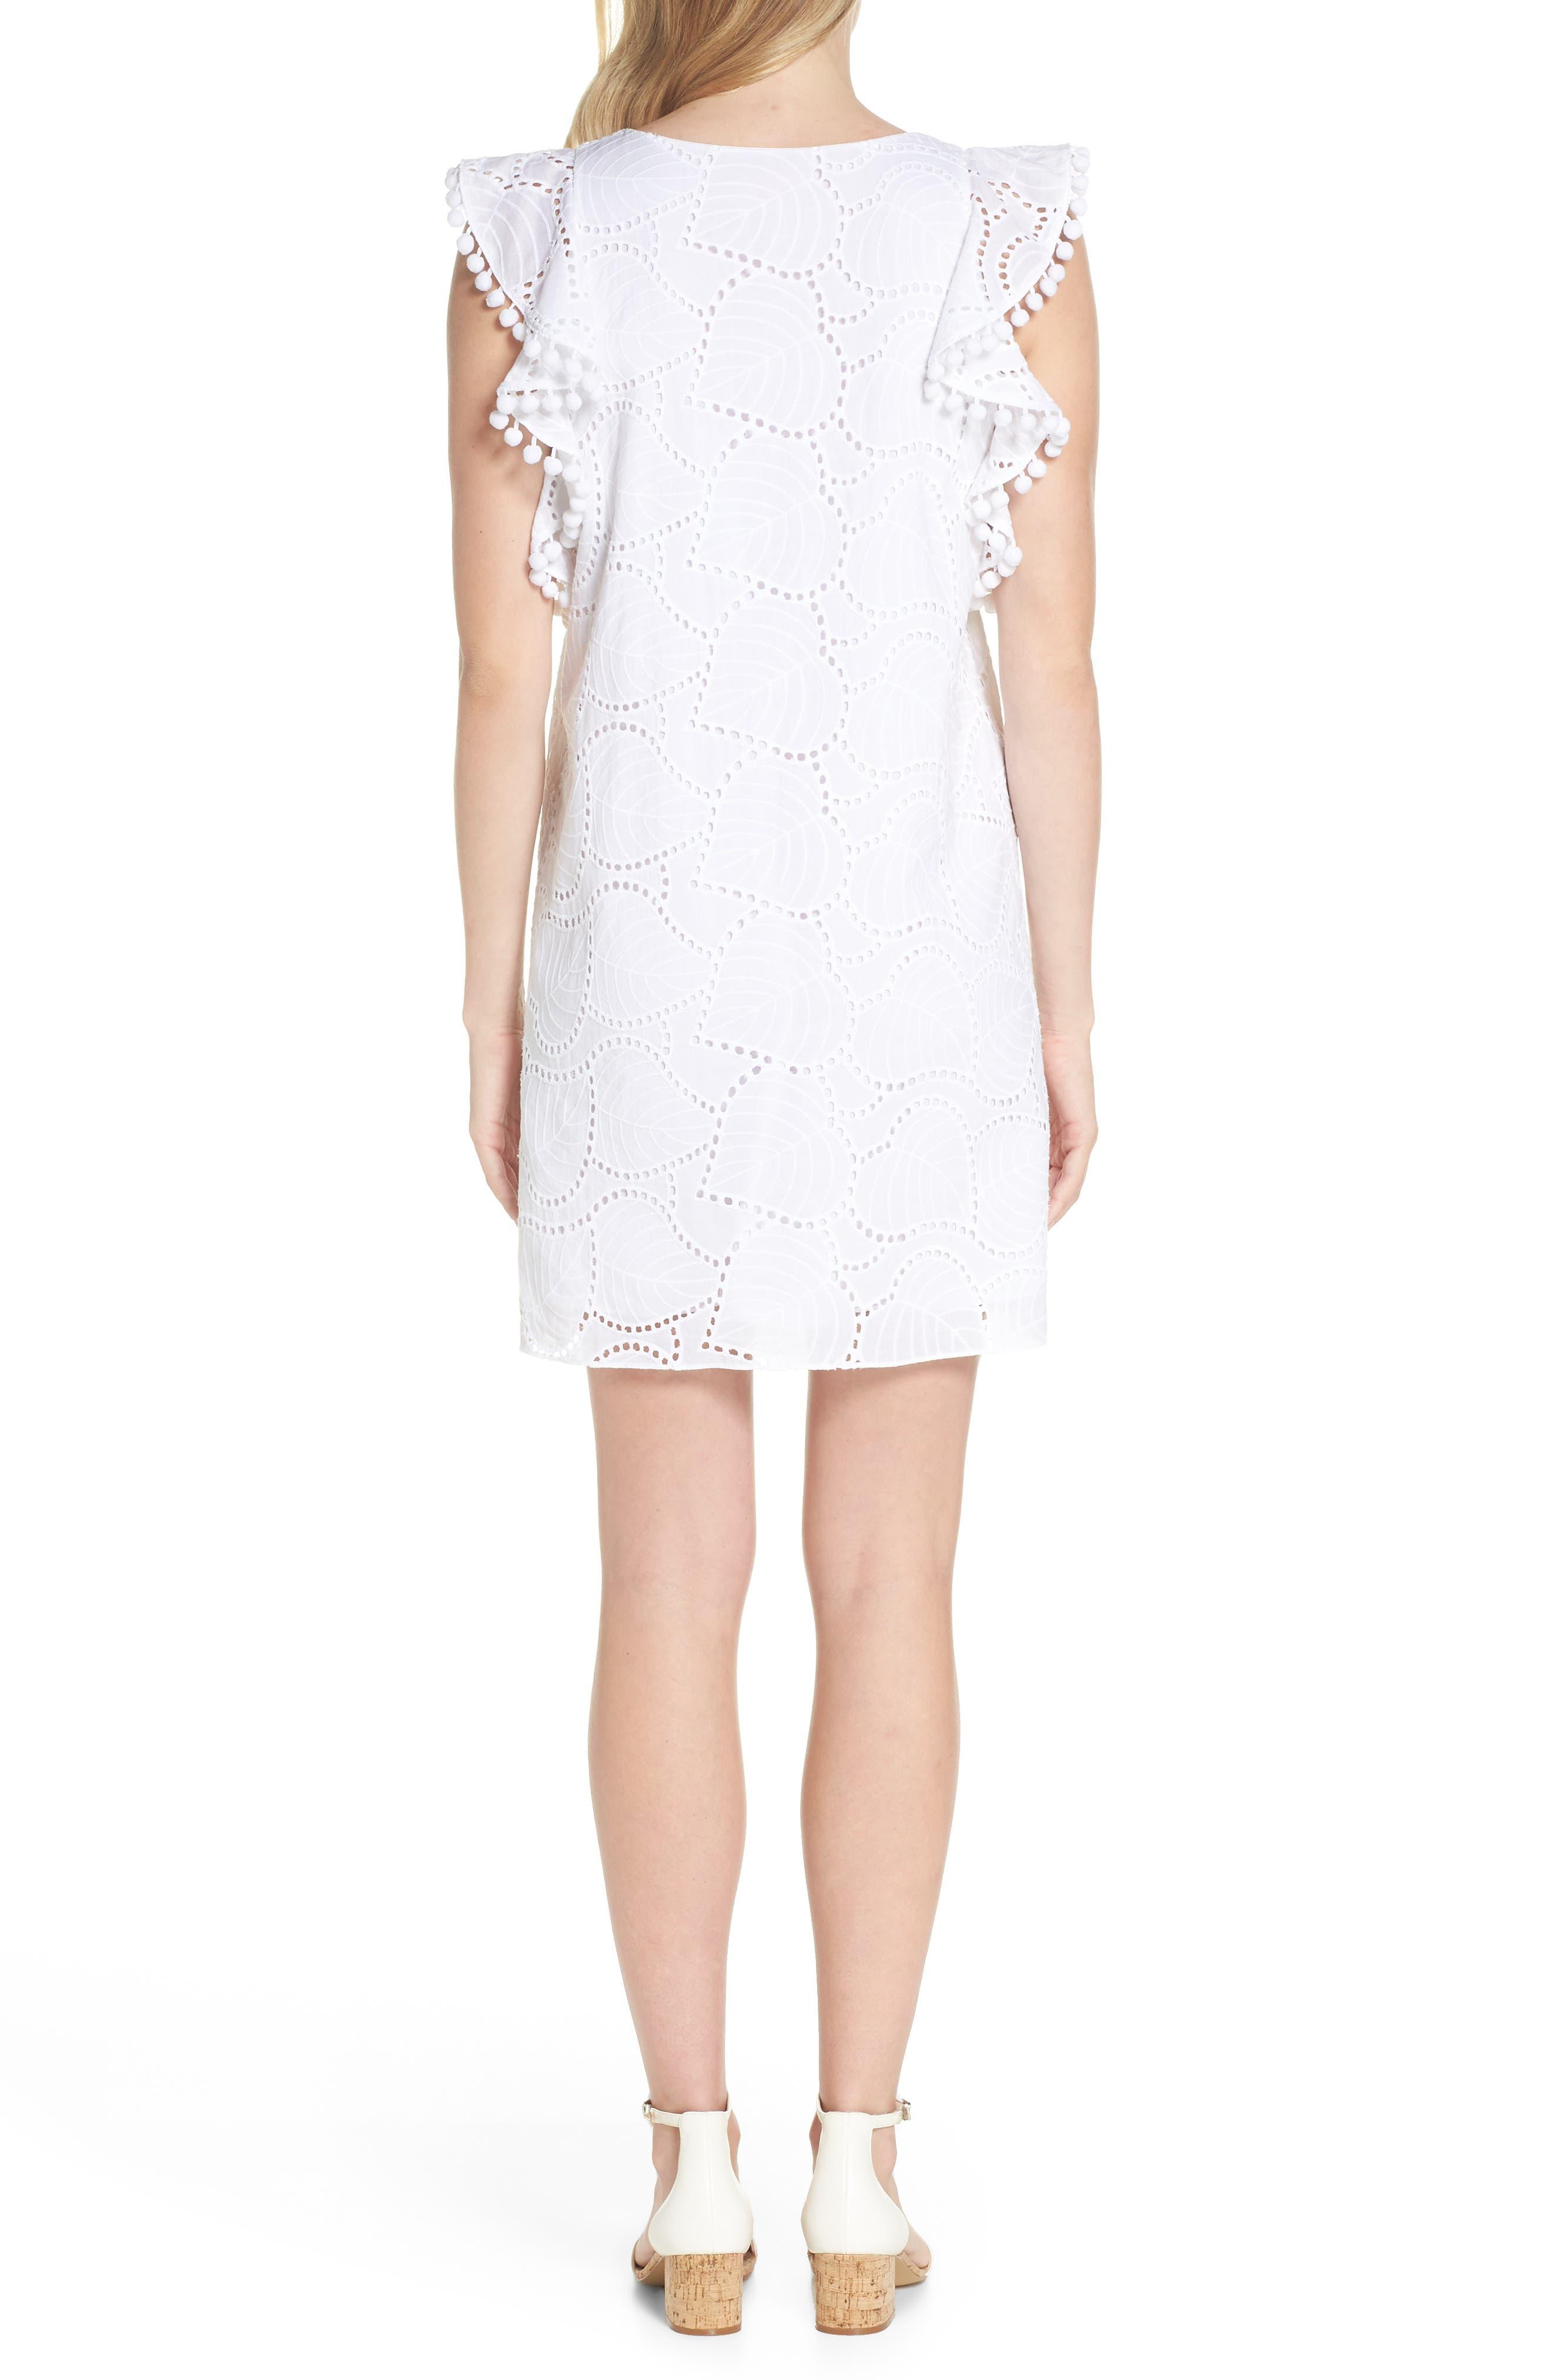 Astara Cotton Eyelet Dress,                             Alternate thumbnail 2, color,                             RESORT WHITE LEAF EYELET